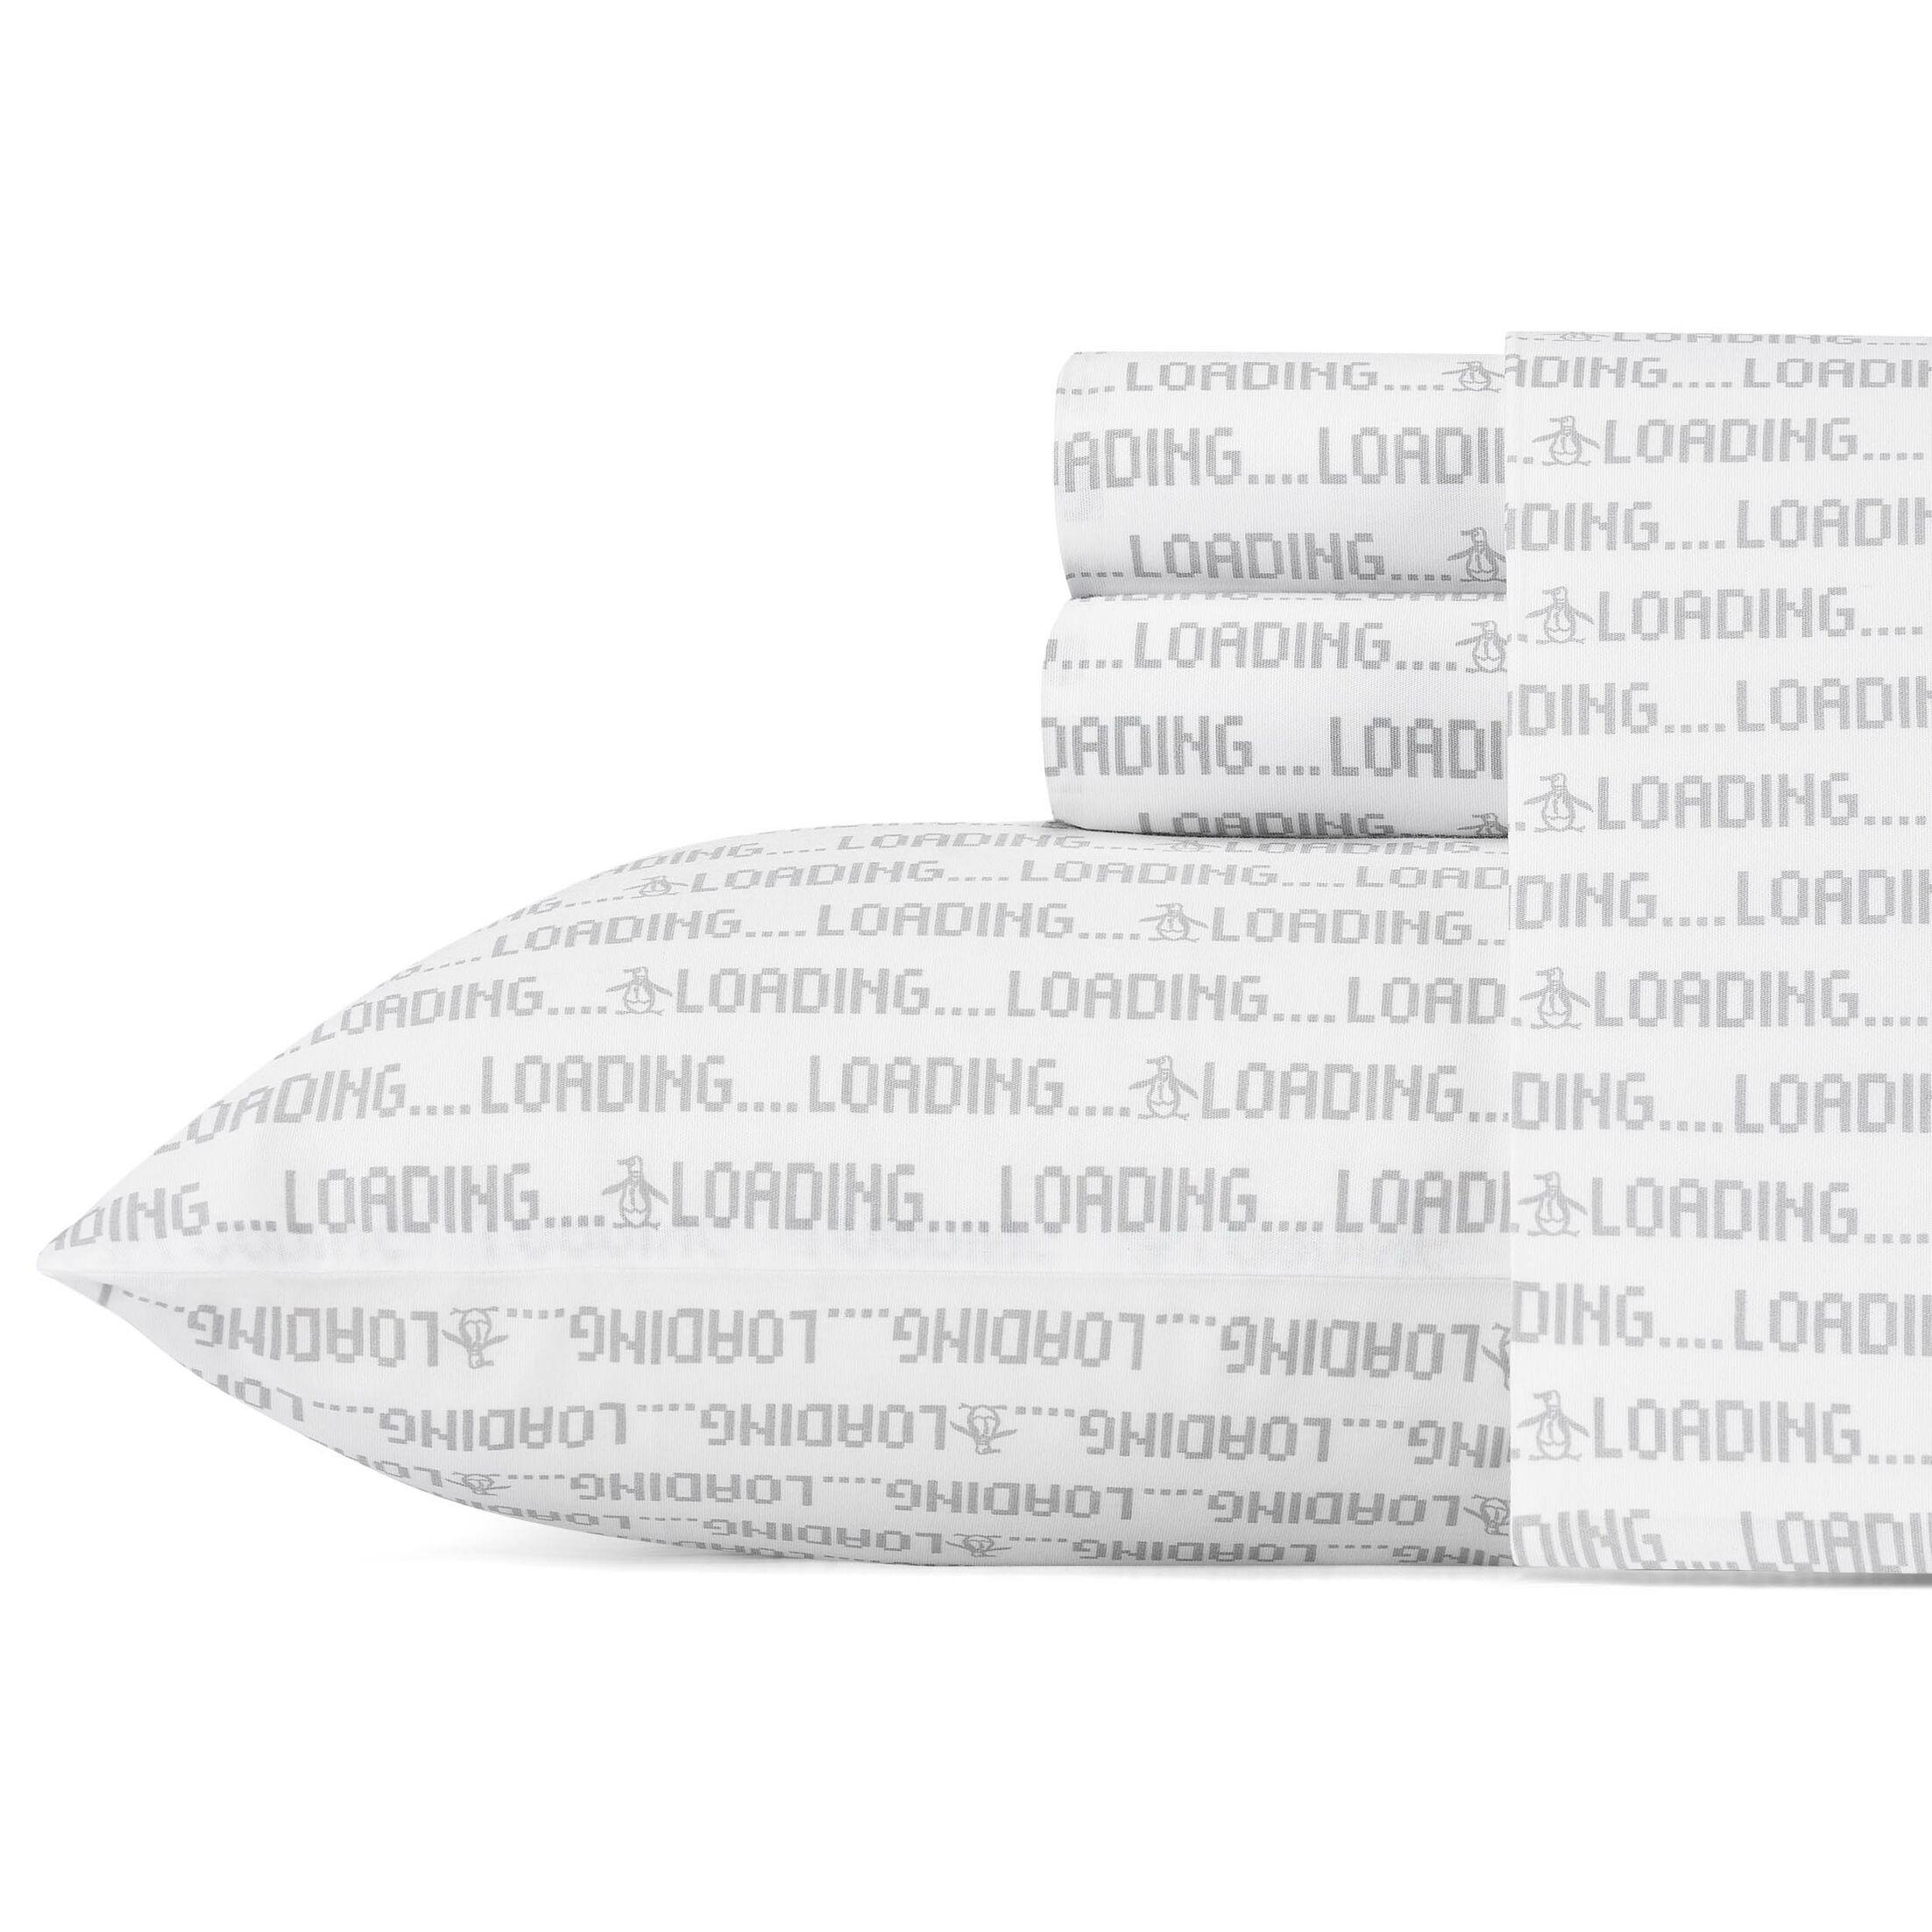 Amell Loading 100% Cotton Sheet Set Size: King